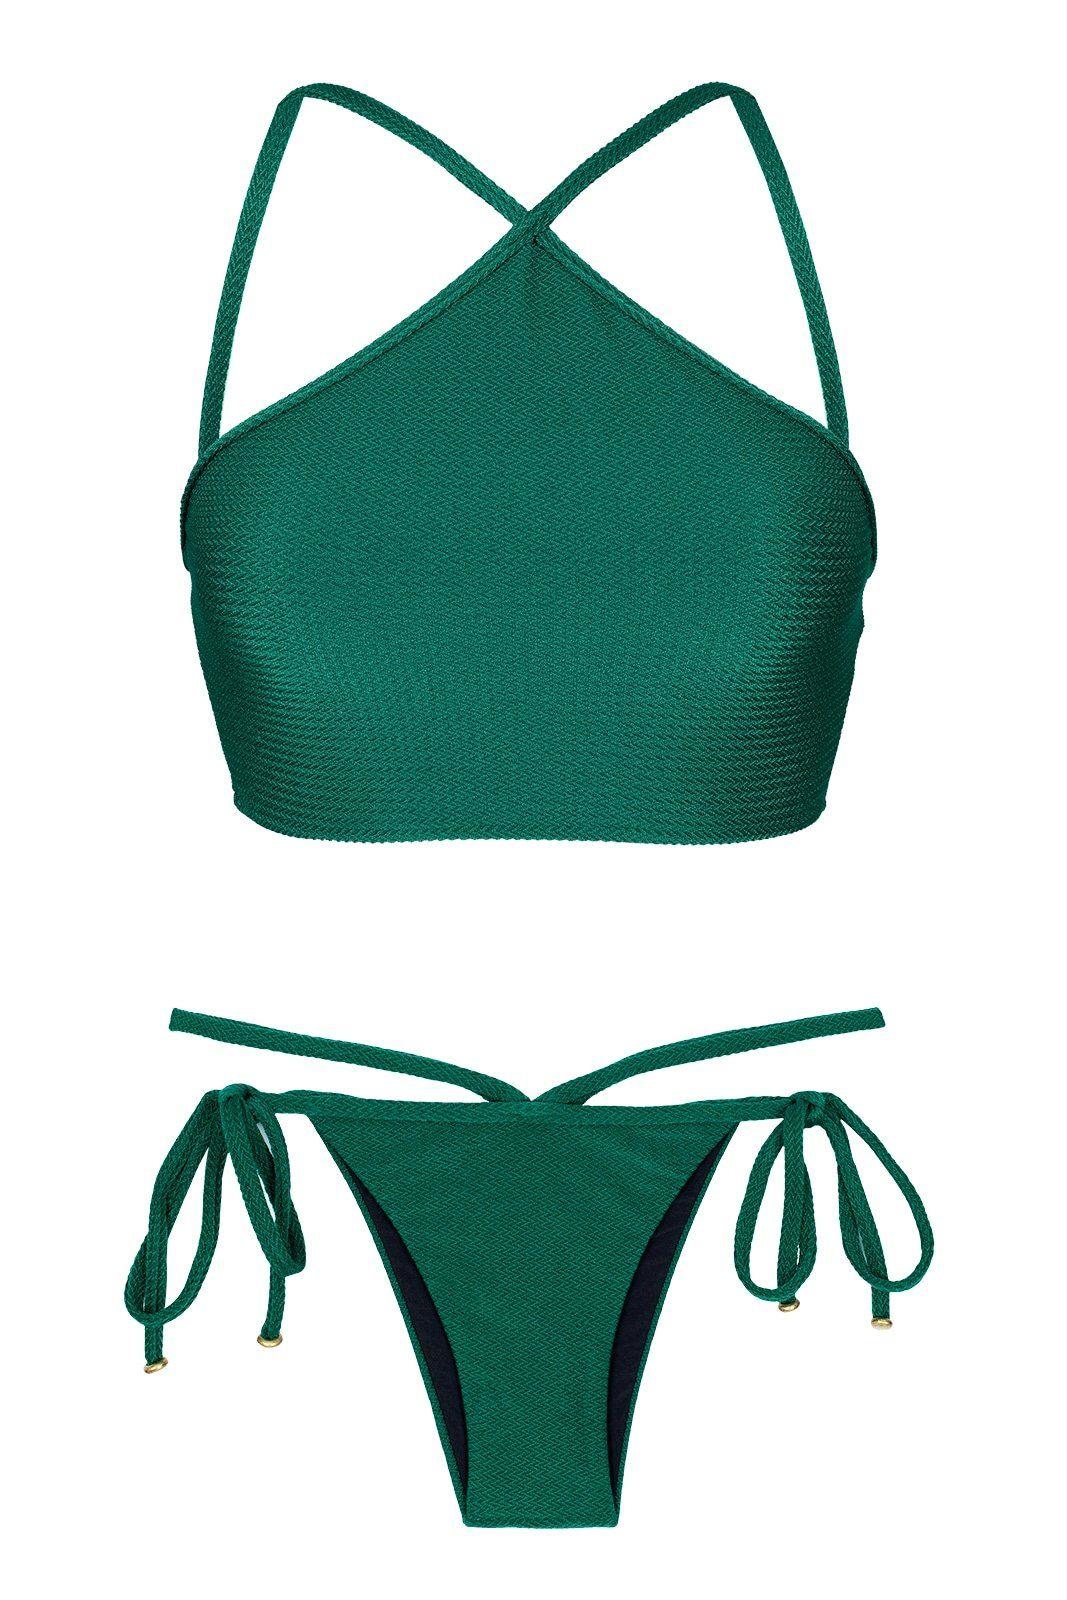 7a4db1f7f0b ... de Sol Brazilian Bikinis by Rio Swim Shop Swimwear. Duna Green Cropped  Neck